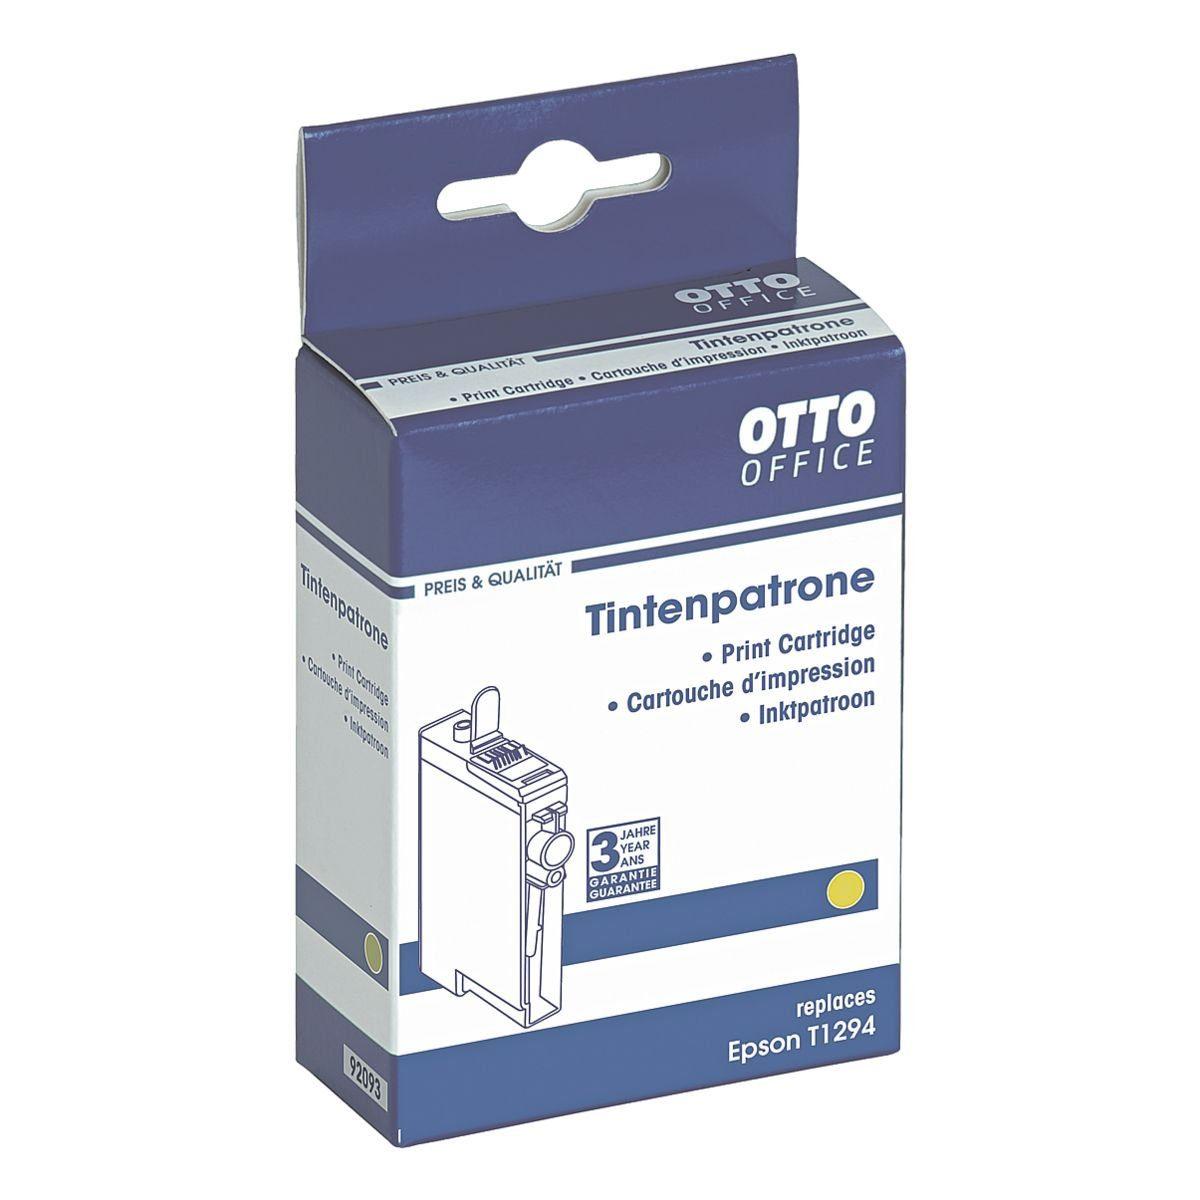 OTTO Office Standard Tintenpatrone ersetzt Epson »T1294«